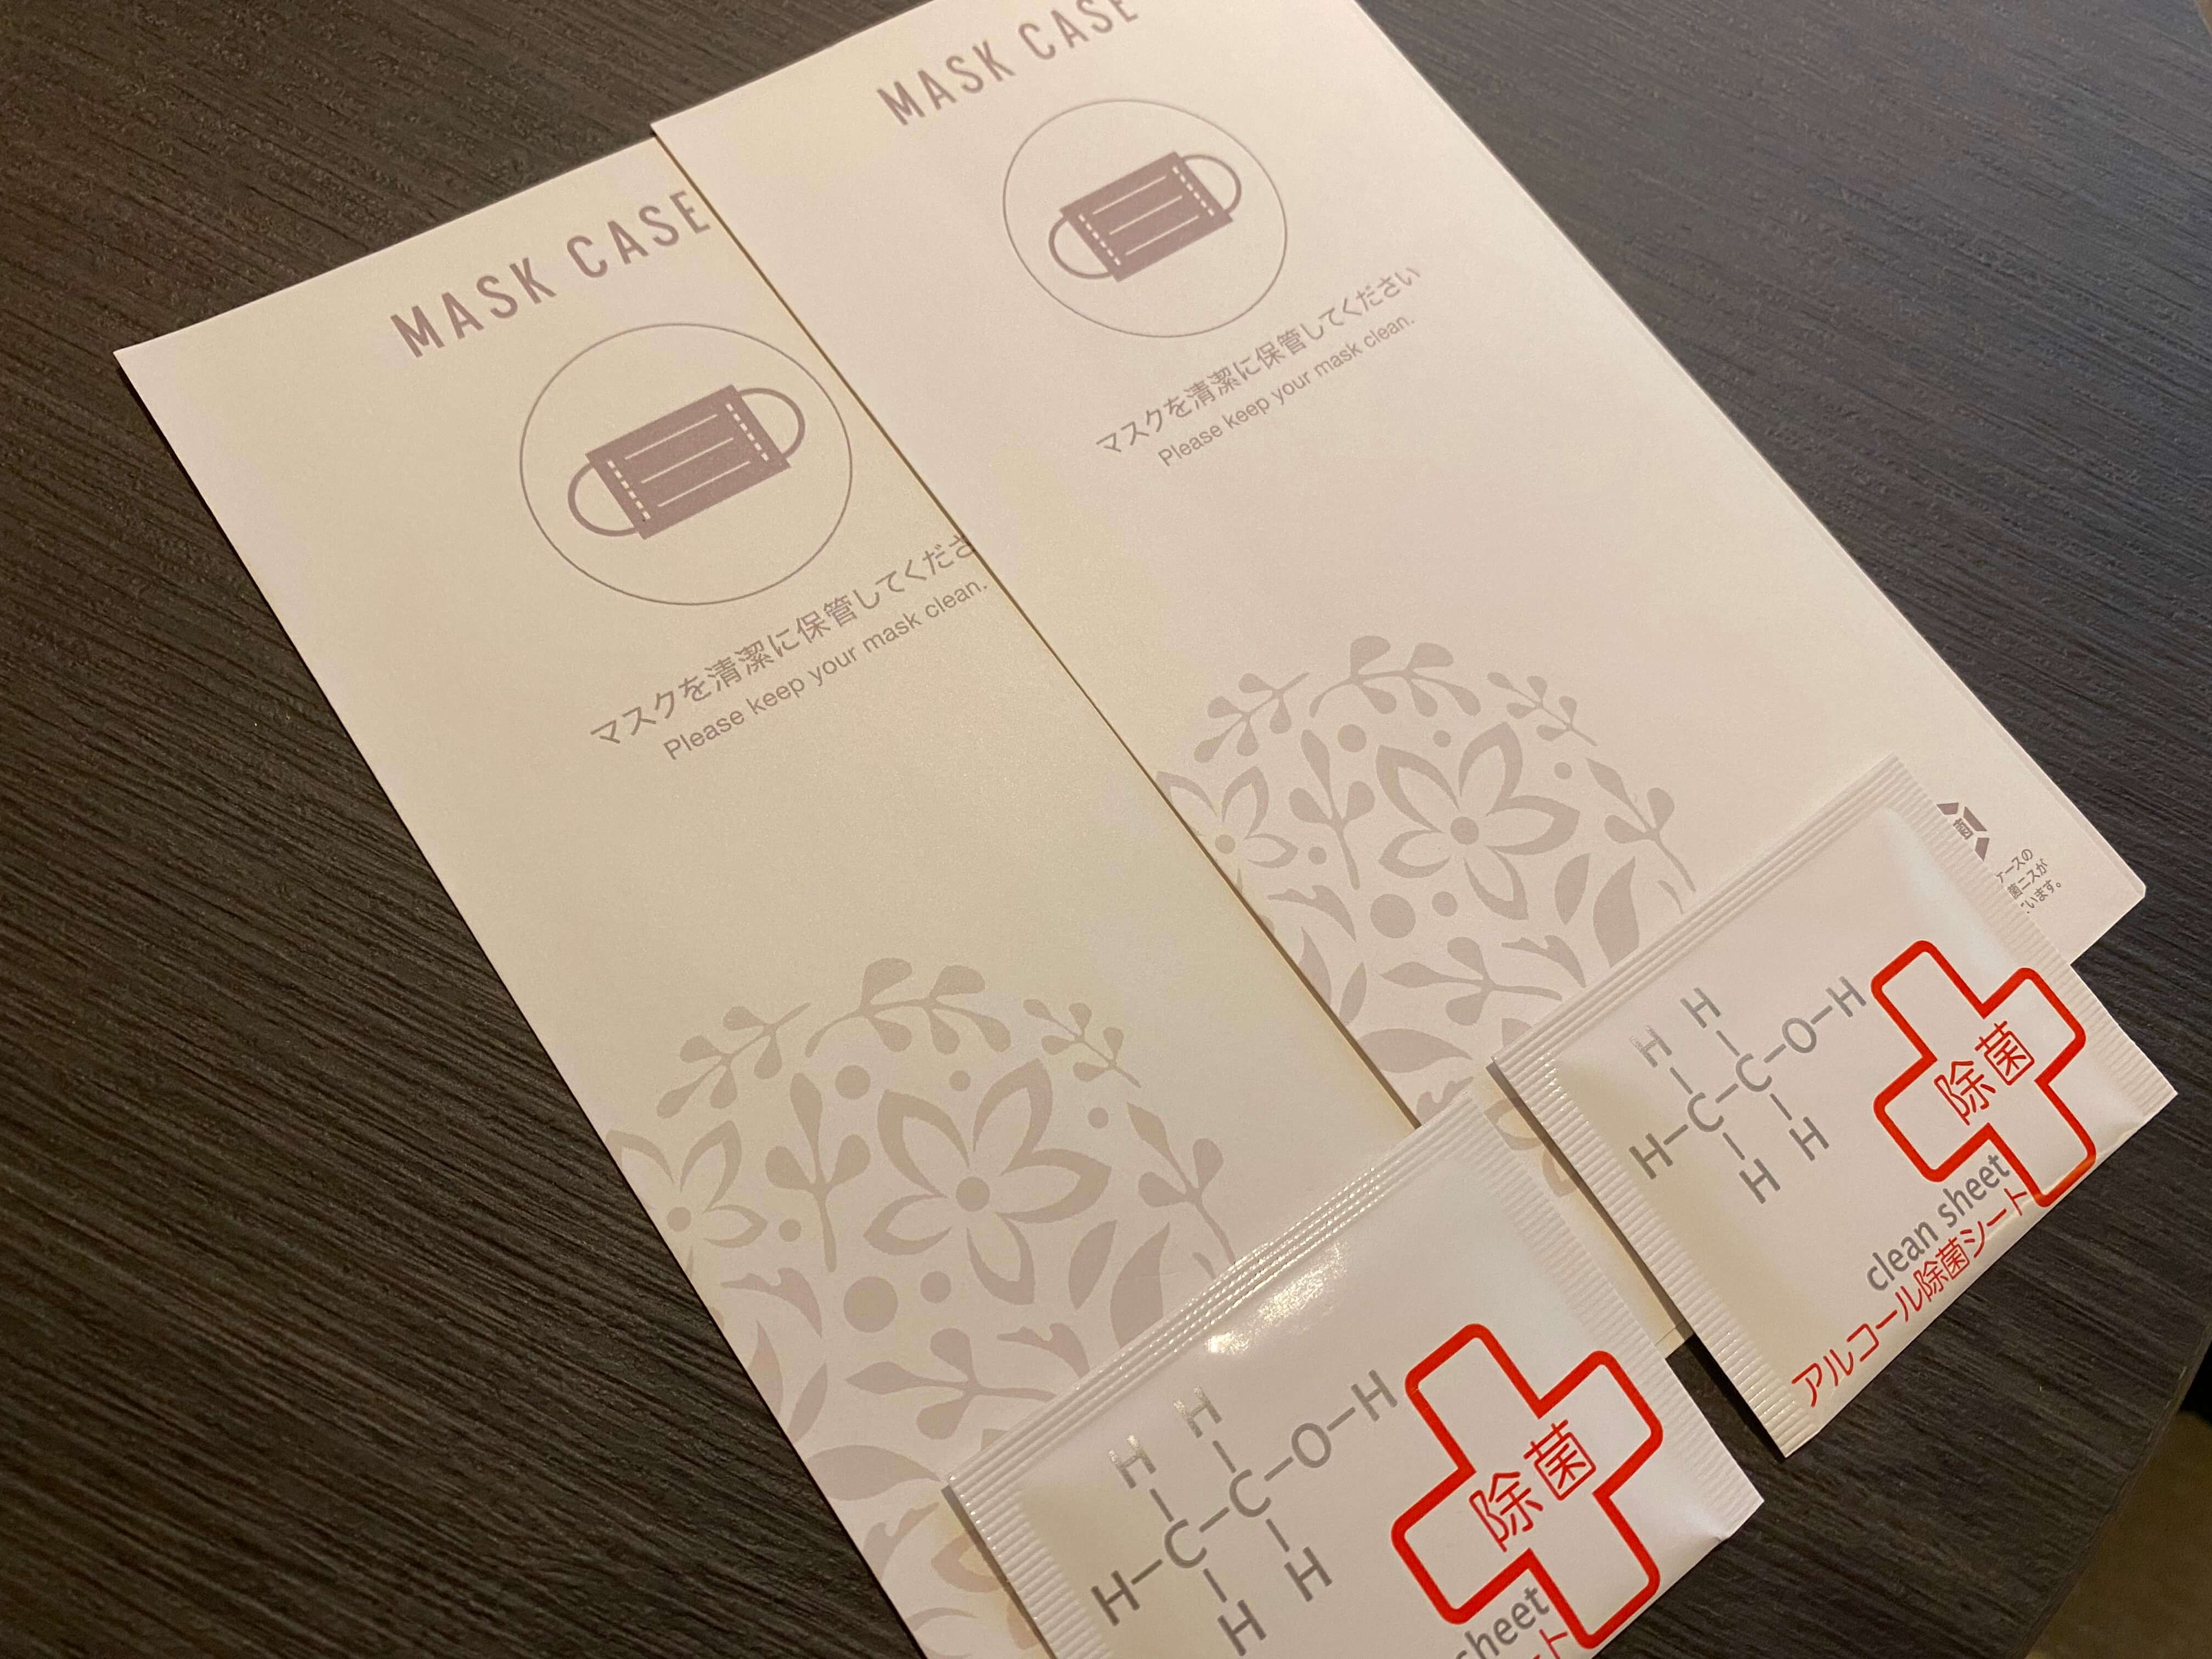 HIYORIチャプター京都 トリビュートポートフォリオホテル マスク入れと消毒